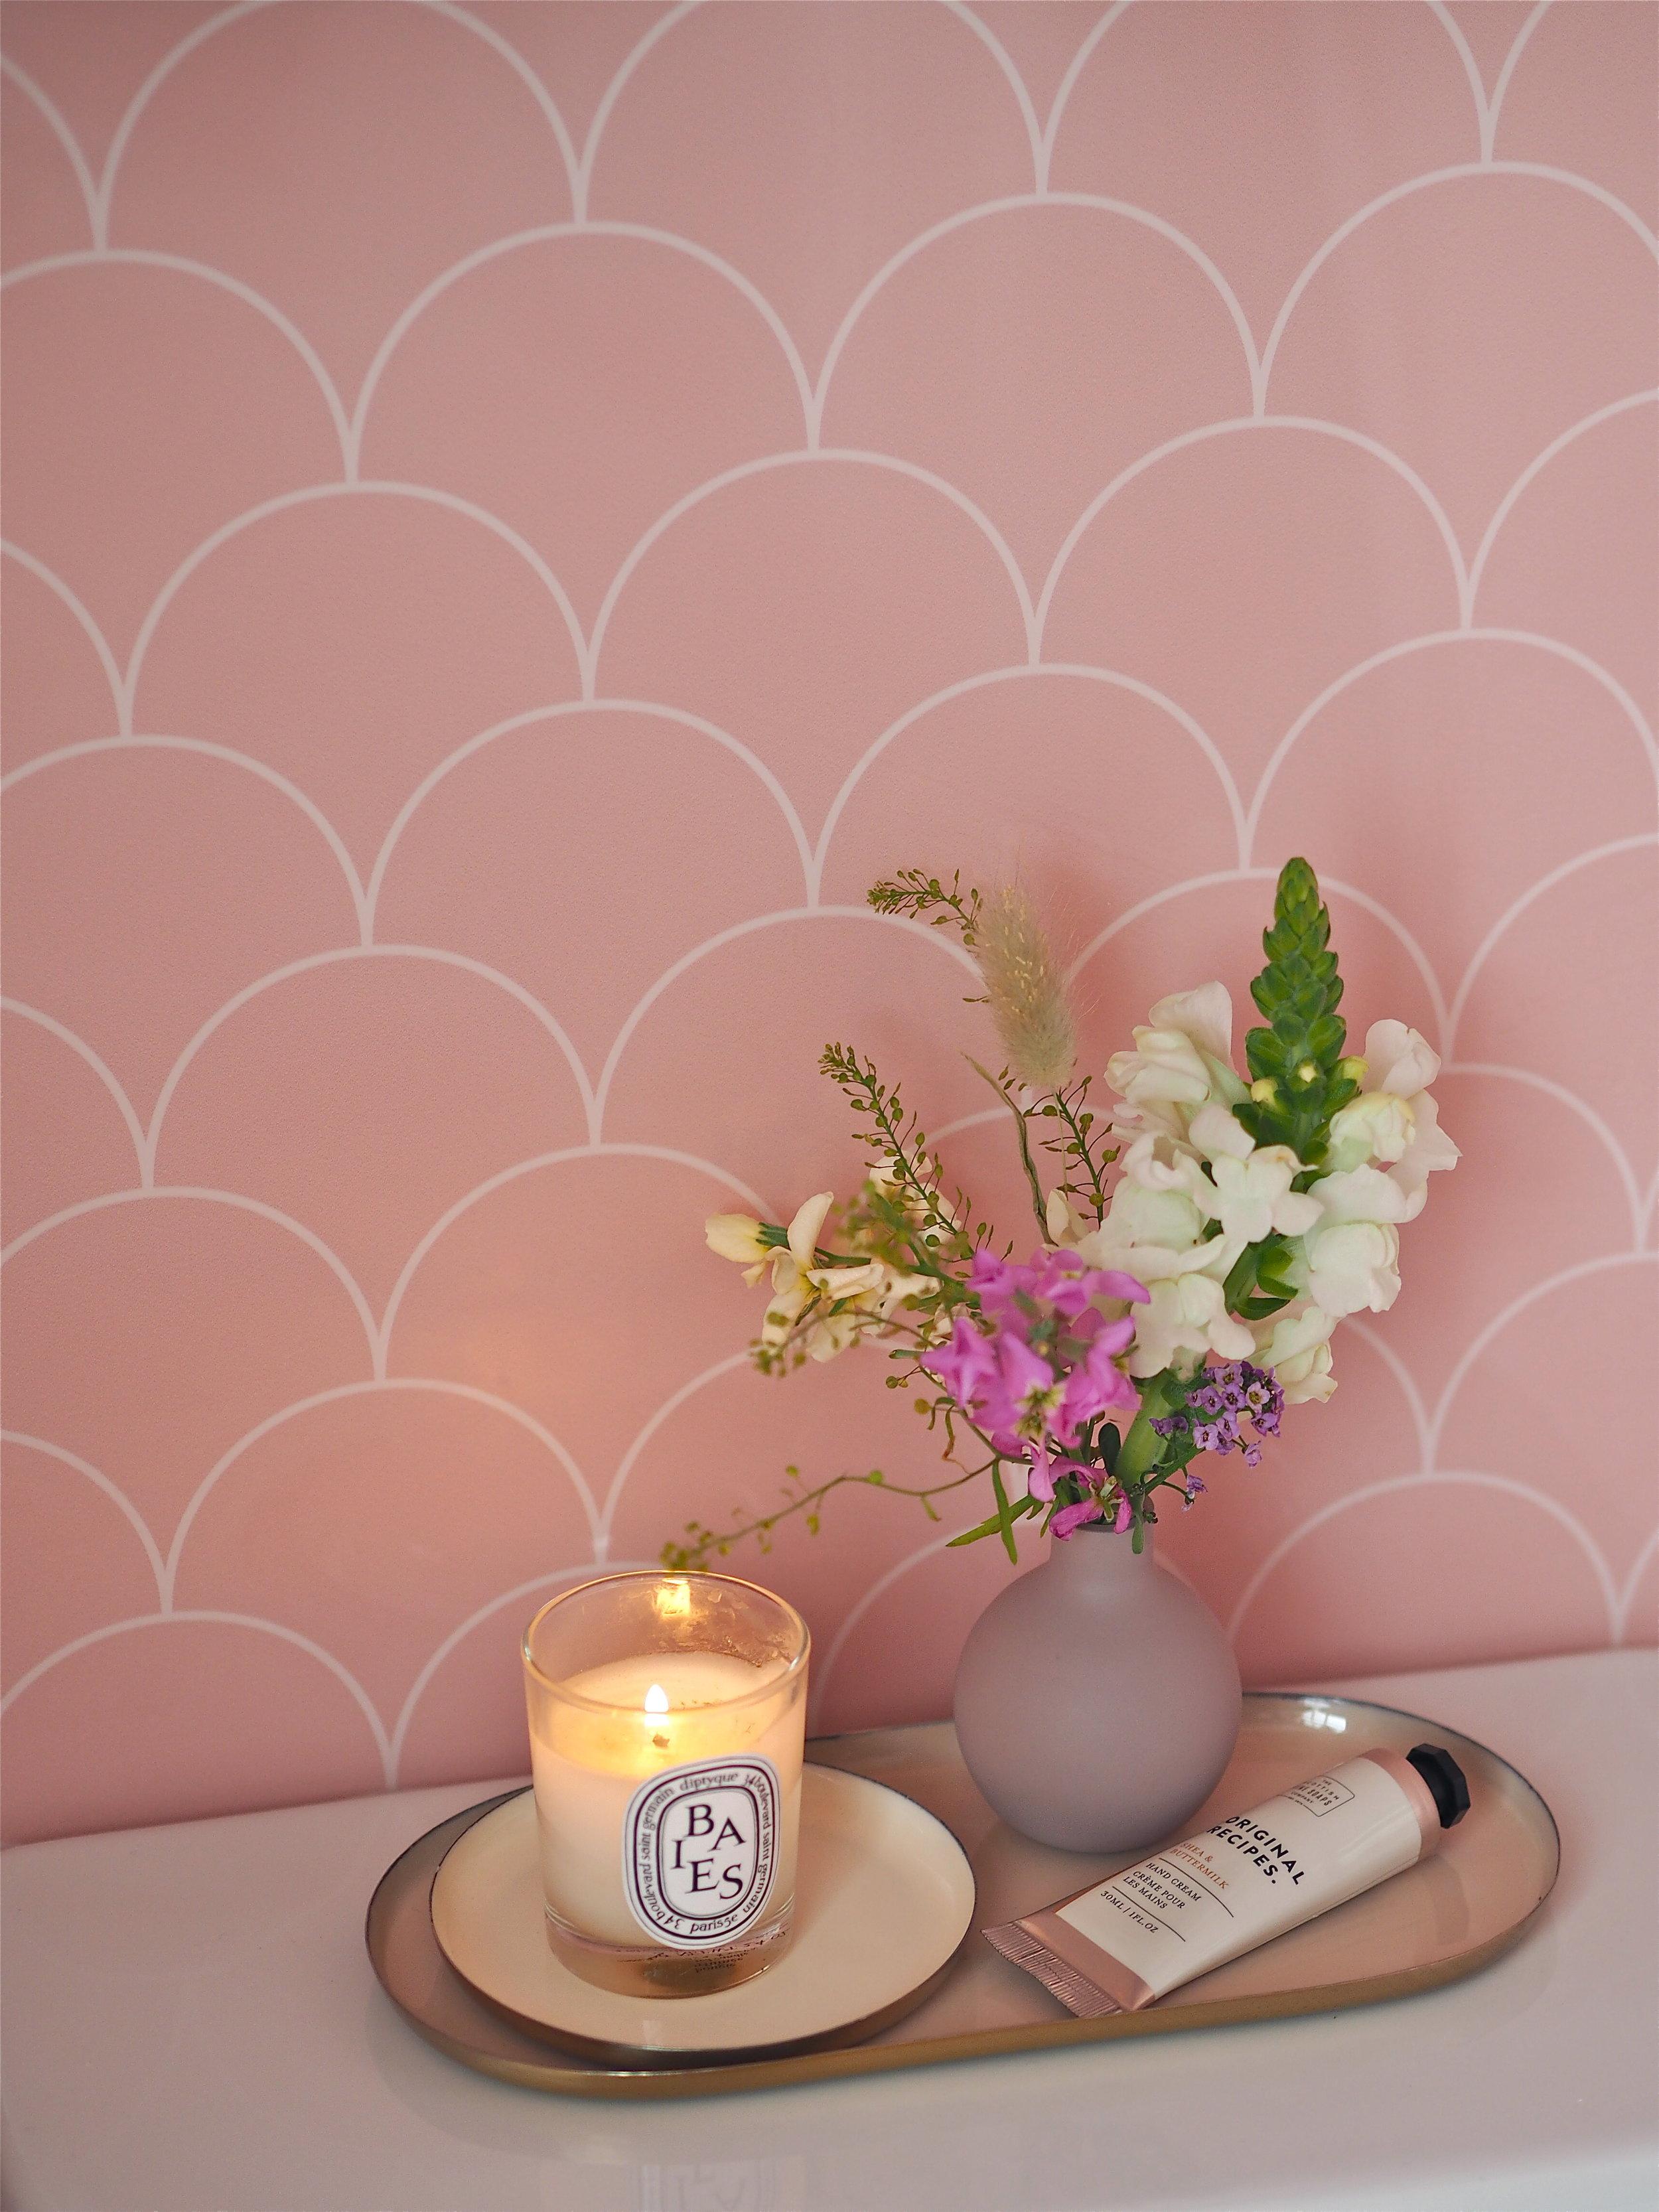 showerwall bathroom panels acrylic pink bathroom